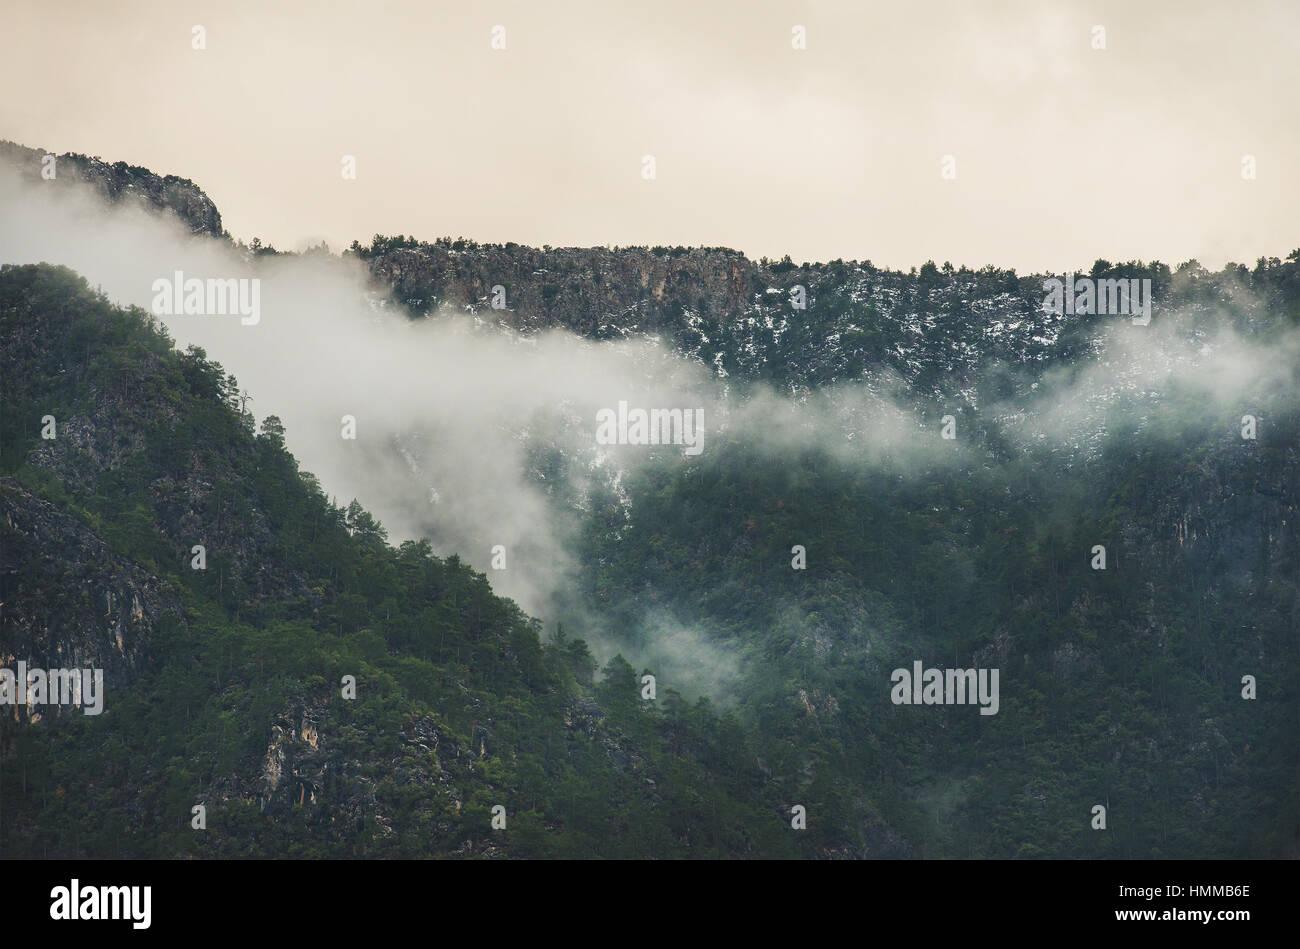 Green slopes of the Taurus mountains, Alanya, Turkey - Stock Image